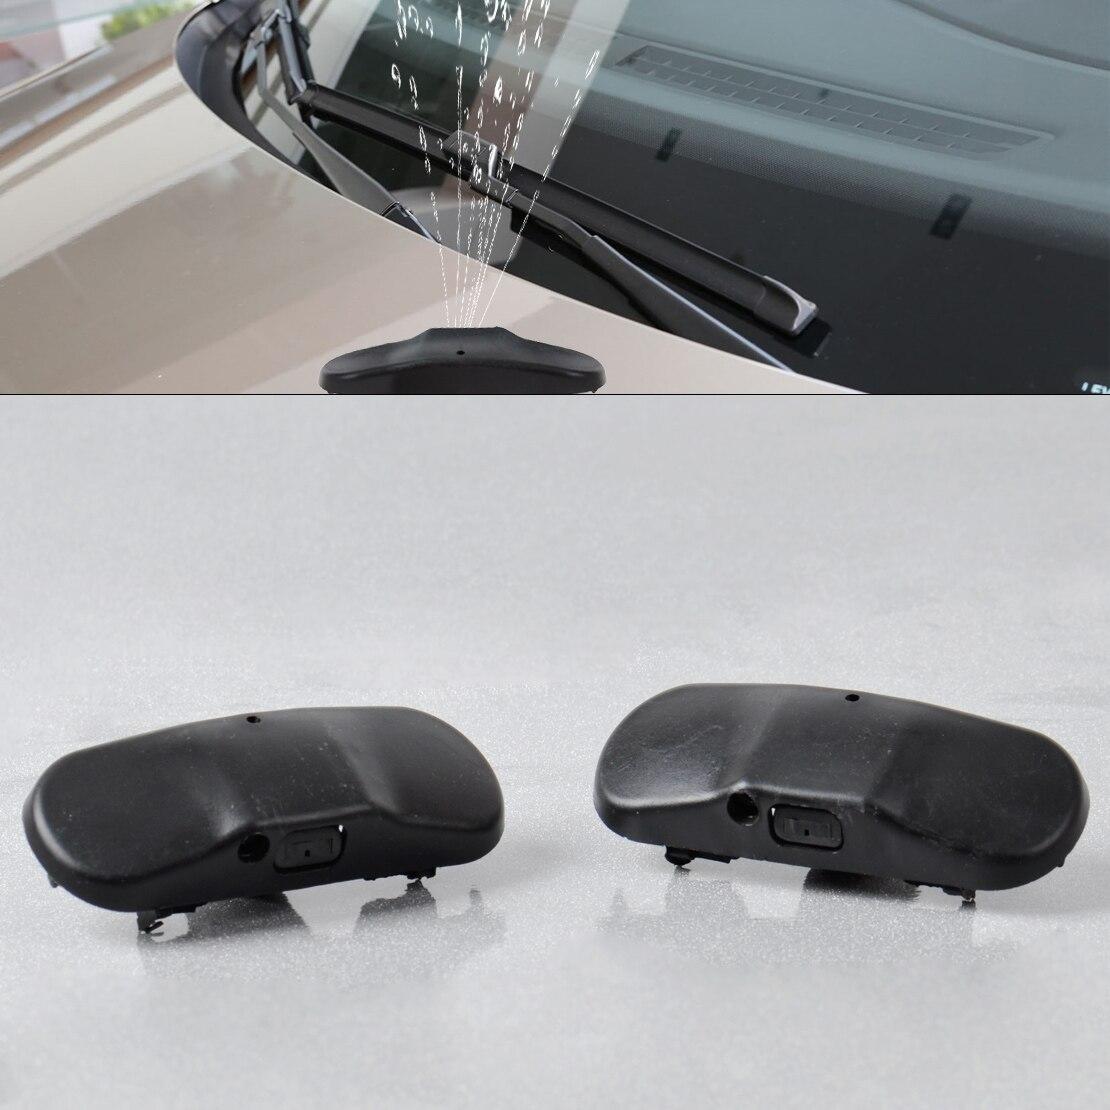 CITALL 2Pcs Black Windscreen Washer Jet Water Spray Nozzle 2KD 955 985 For Volkswagen VW Passat B6 Jetta Golf GTI Caddy